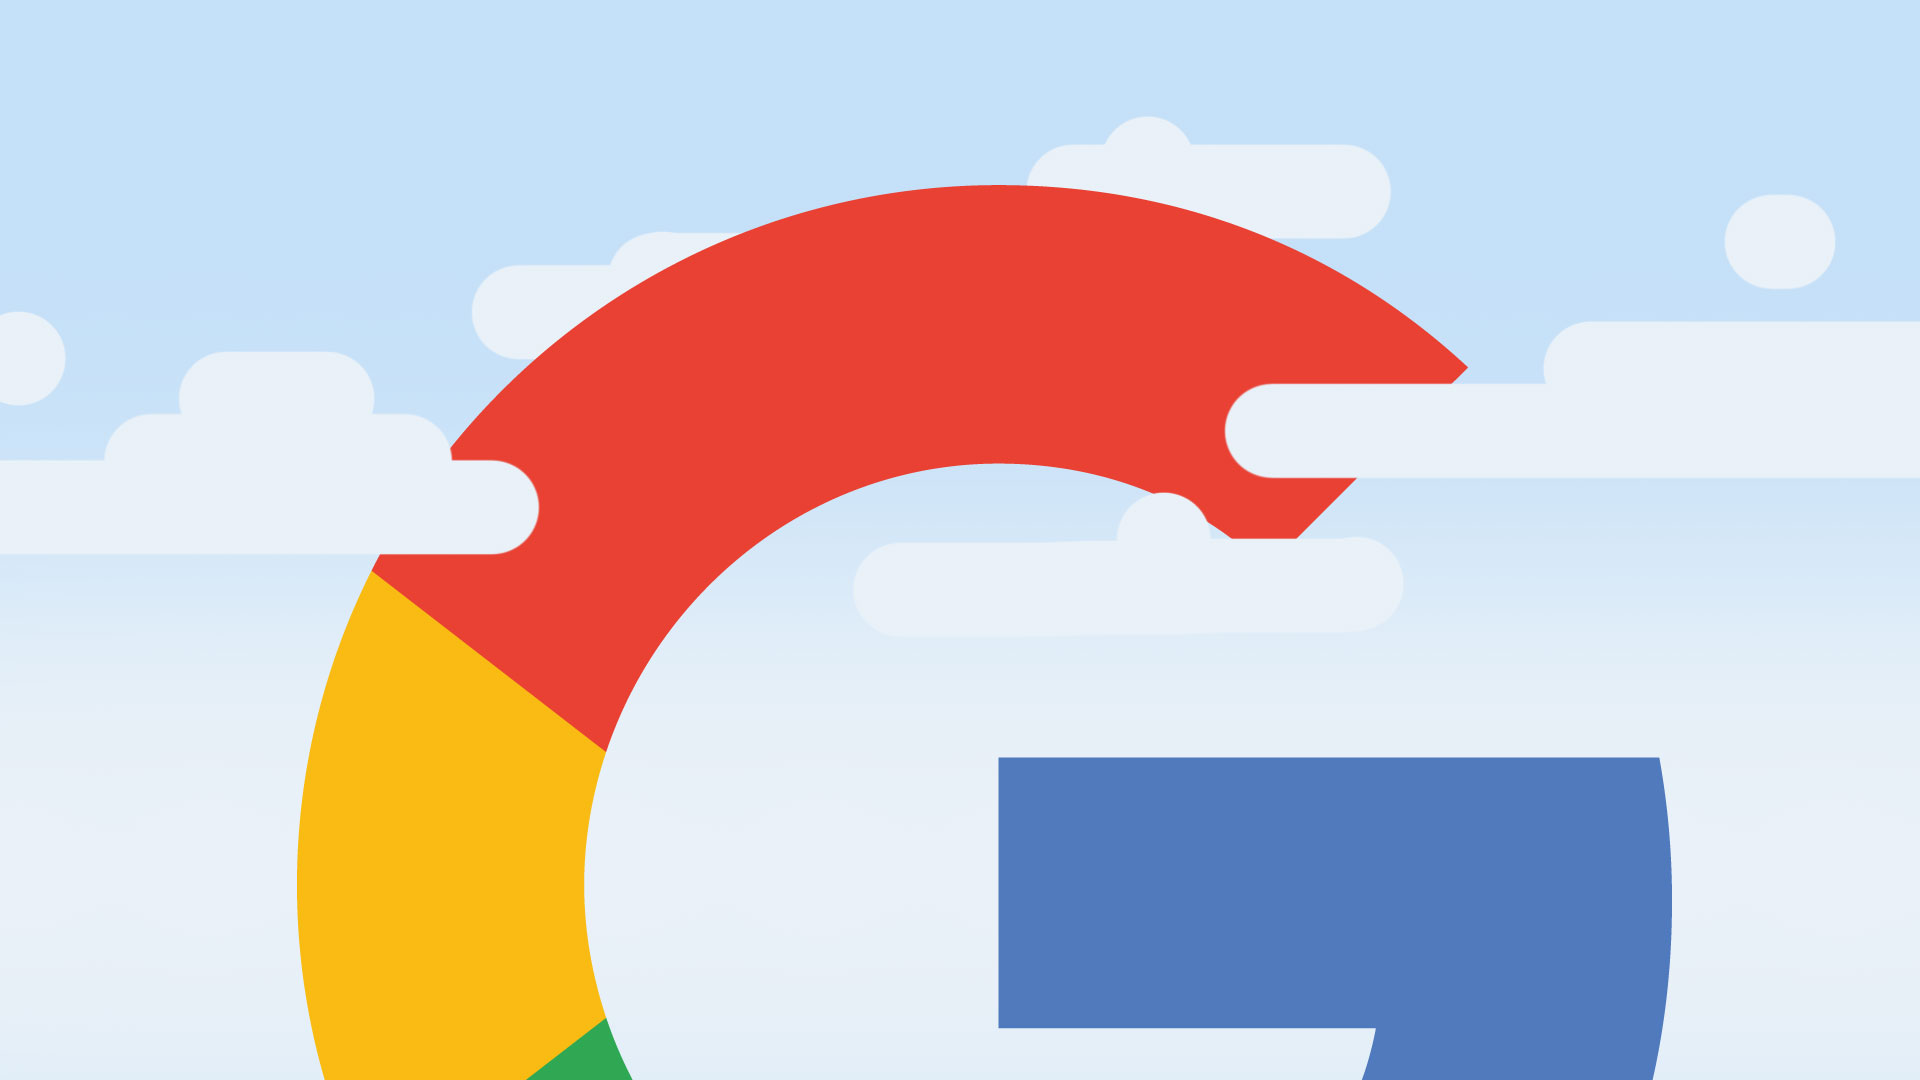 Top-of-Google.jpg.pagespeed.ce.VKfTQstVzU